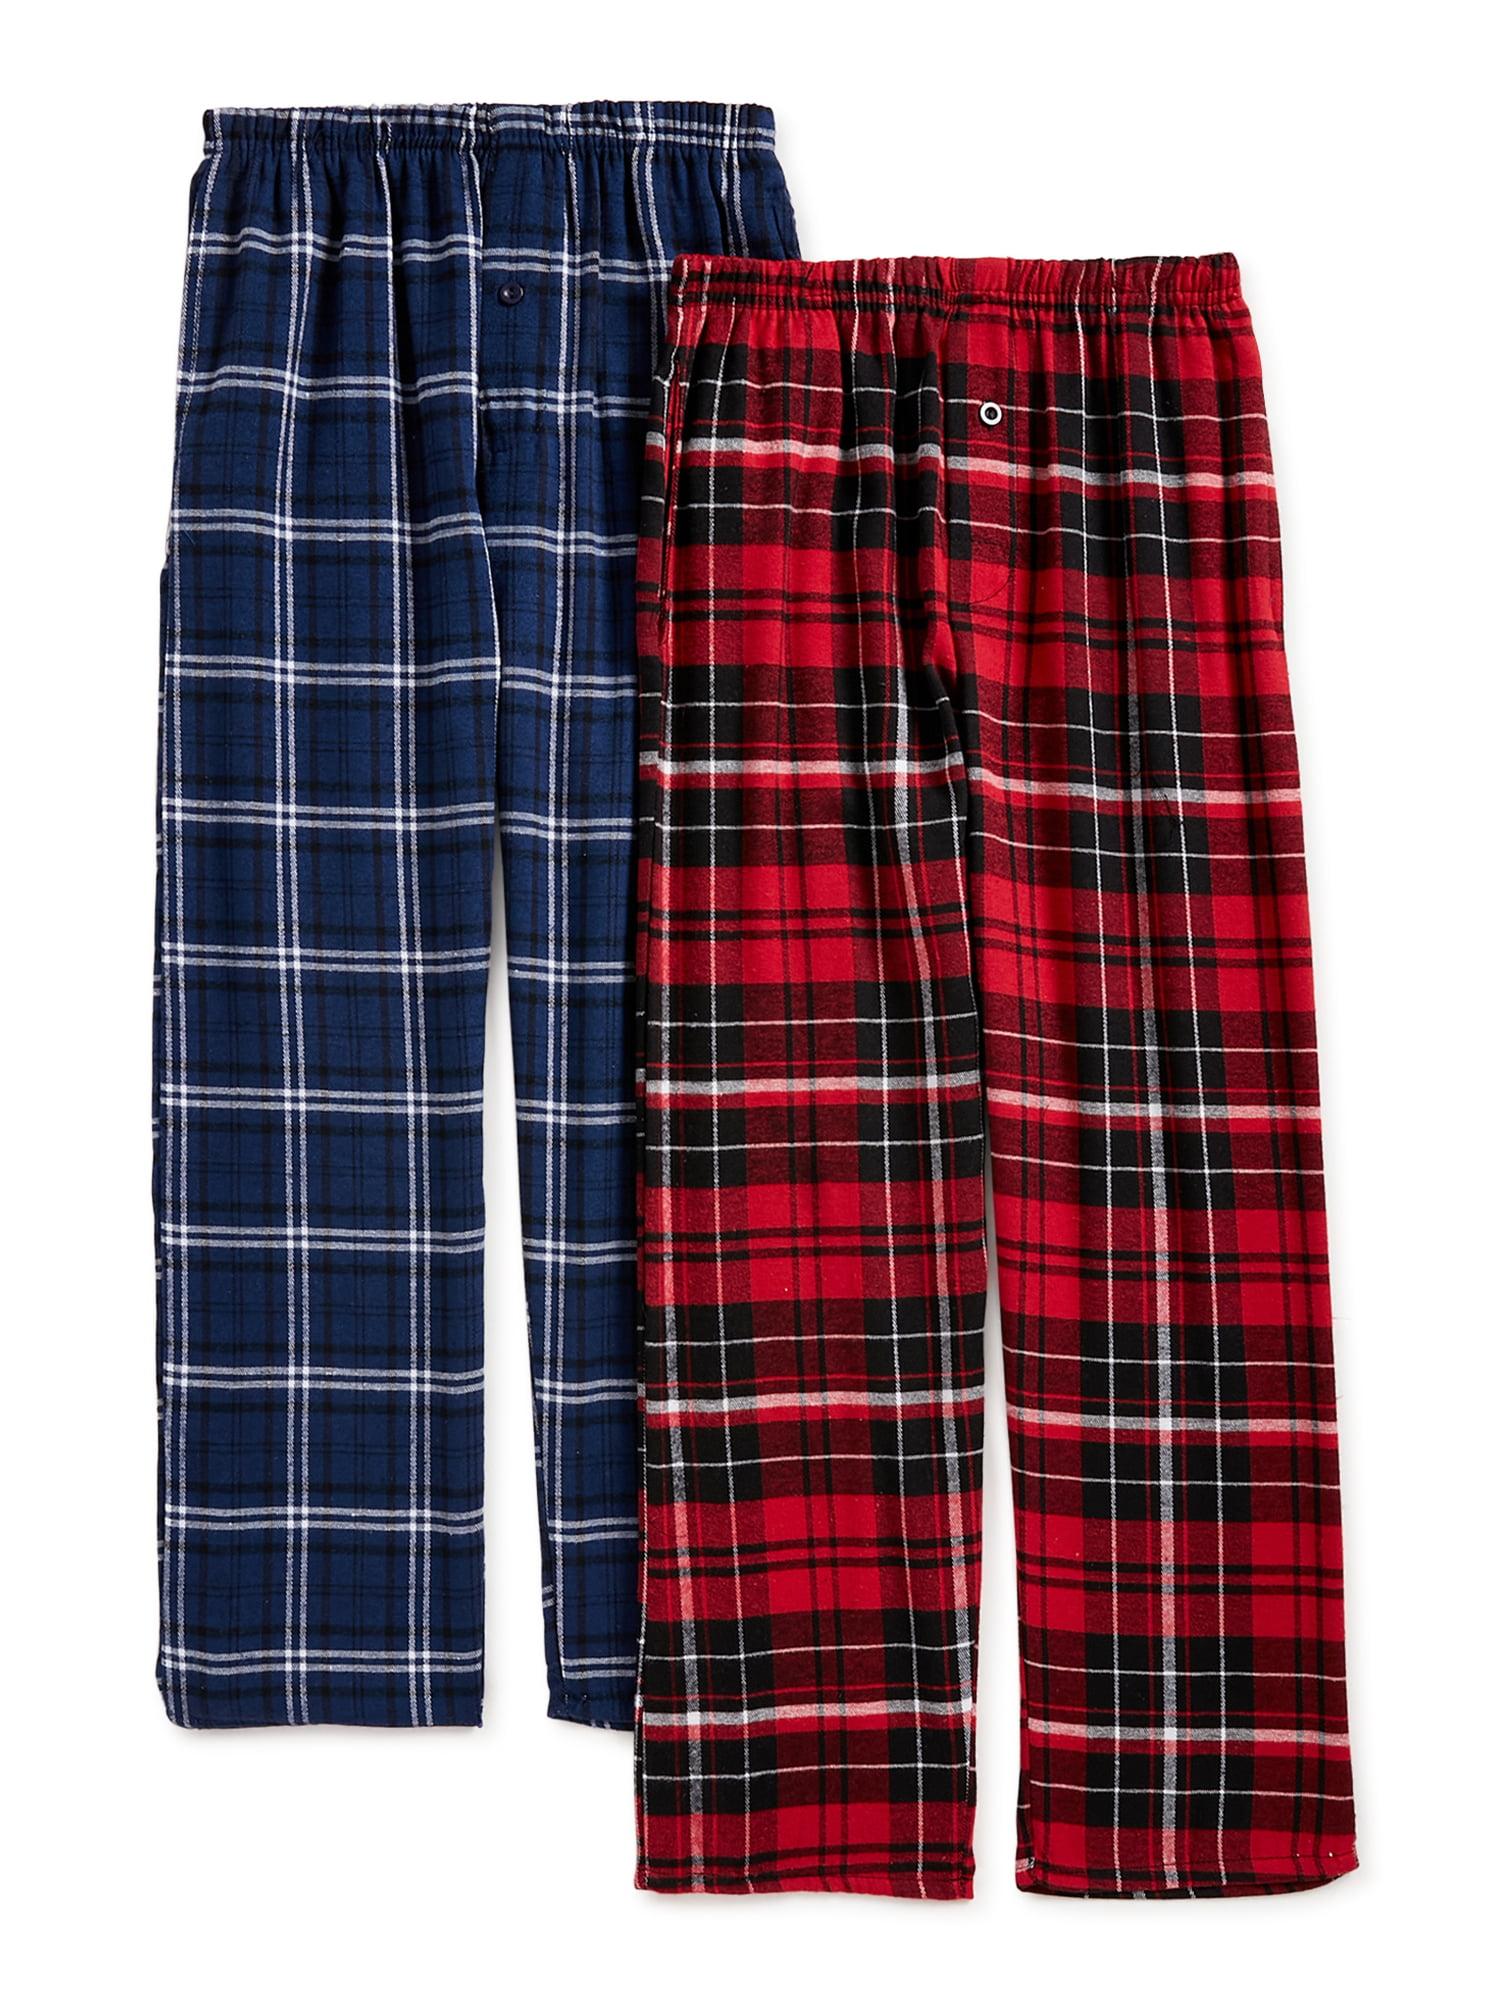 ChampionShip Gold - Championship Gold Boys Pajama Pants, 2-Pack, Sizes 8-18  - Walmart.com - Walmart.com